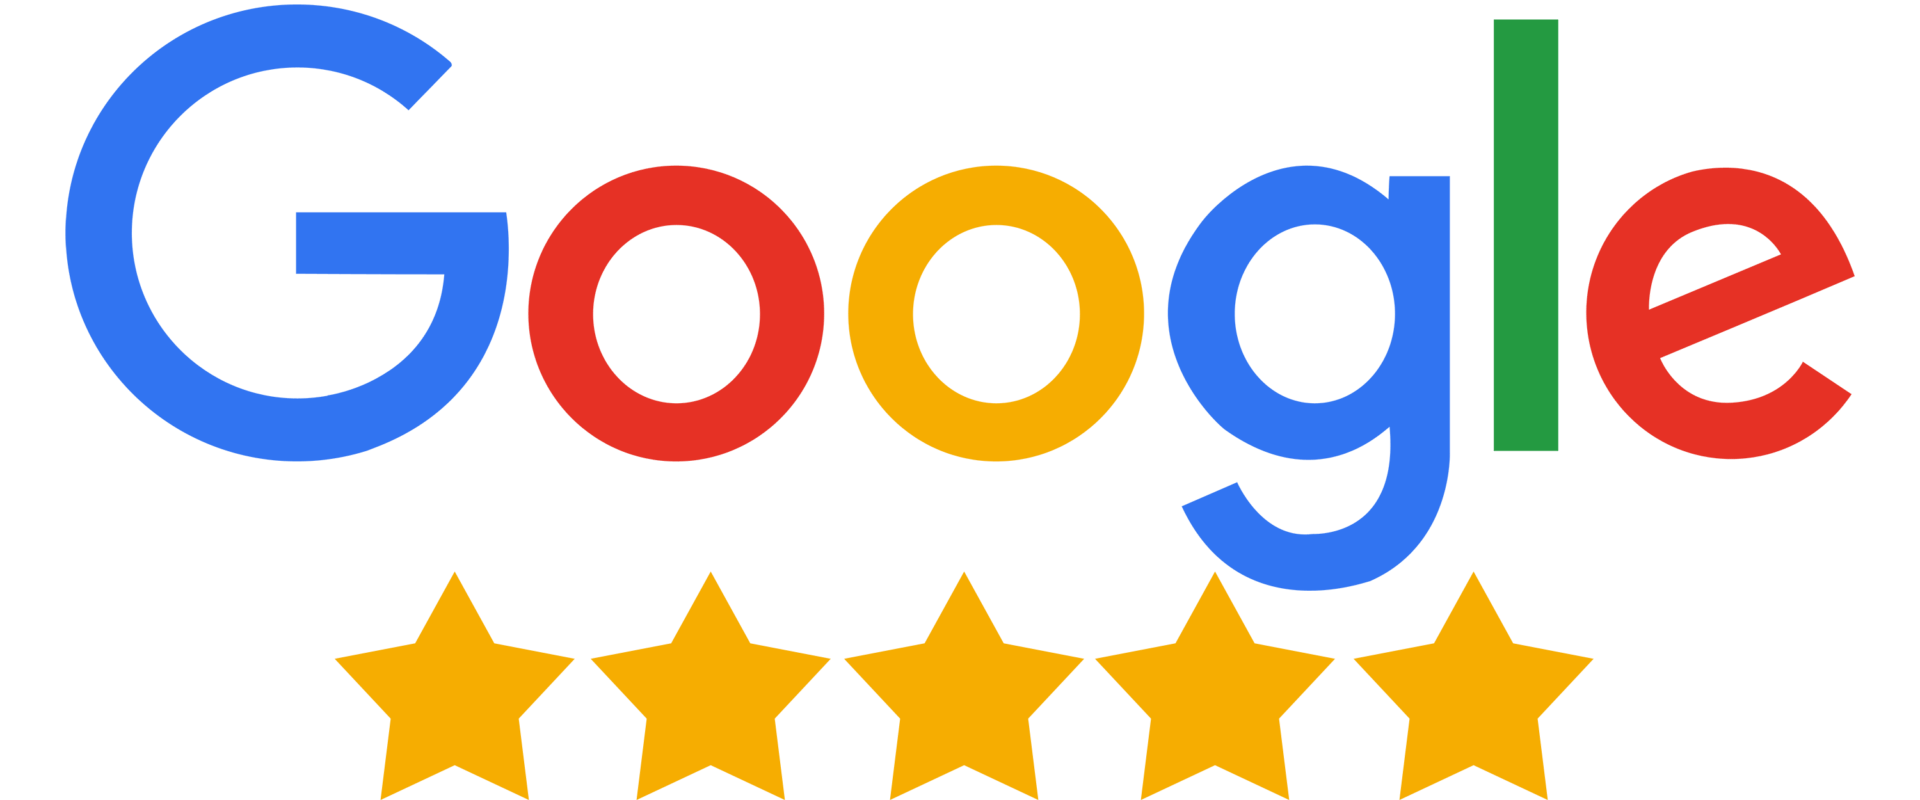 5-star-reviews-png-5